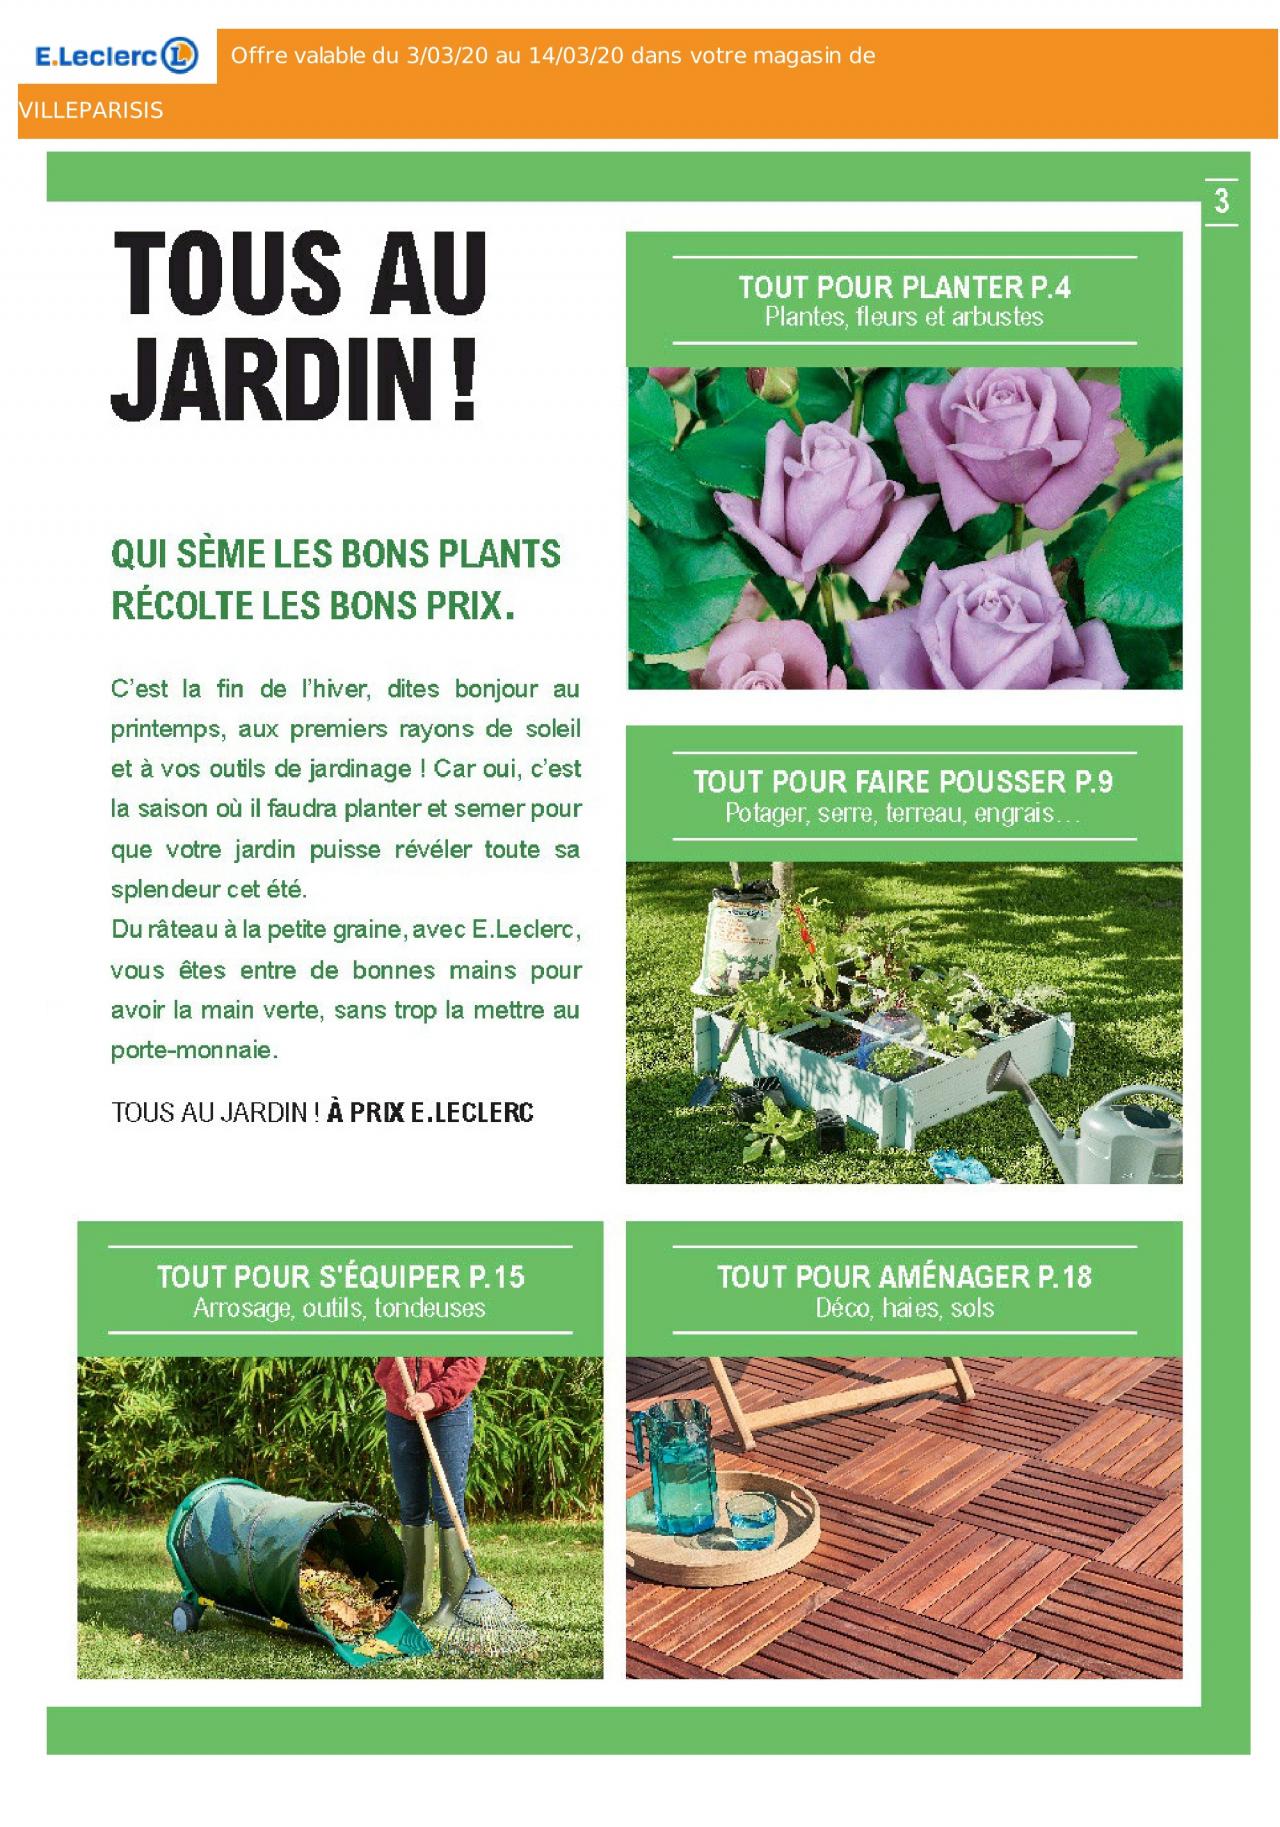 E.leclerc Solde Du 03/03/2020 | Kupino.fr tout Tondeuse Leclerc Jardin